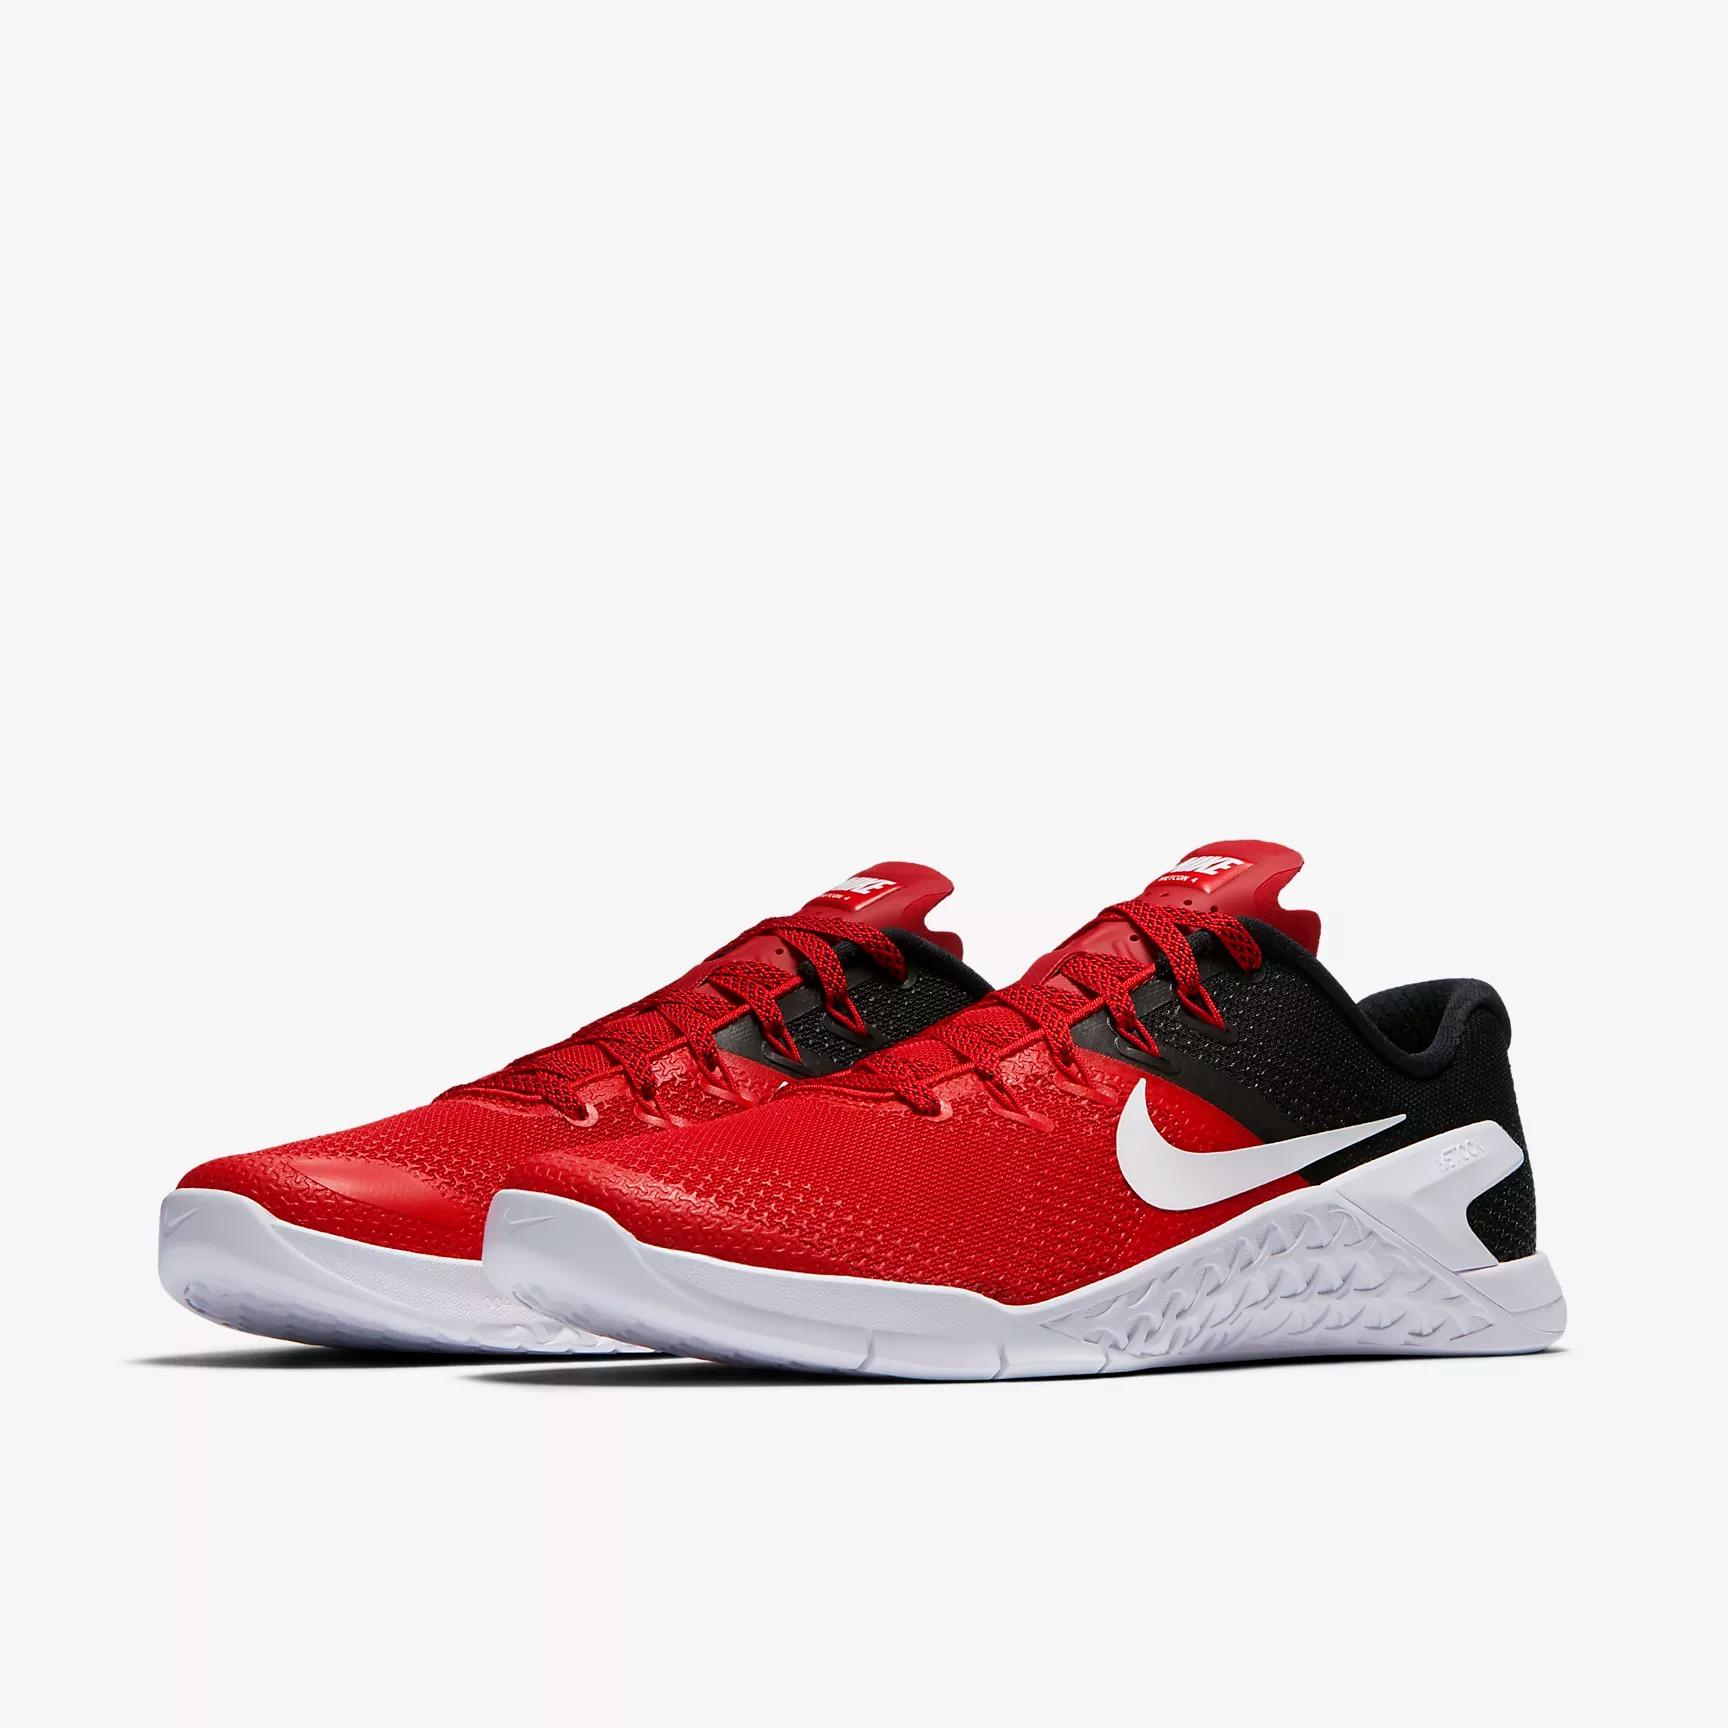 size 40 21e73 8e2a9 Nike Metcon 4 Training Shoes - SPORT SHOES TRAINING SHOES - Superfanas.lt